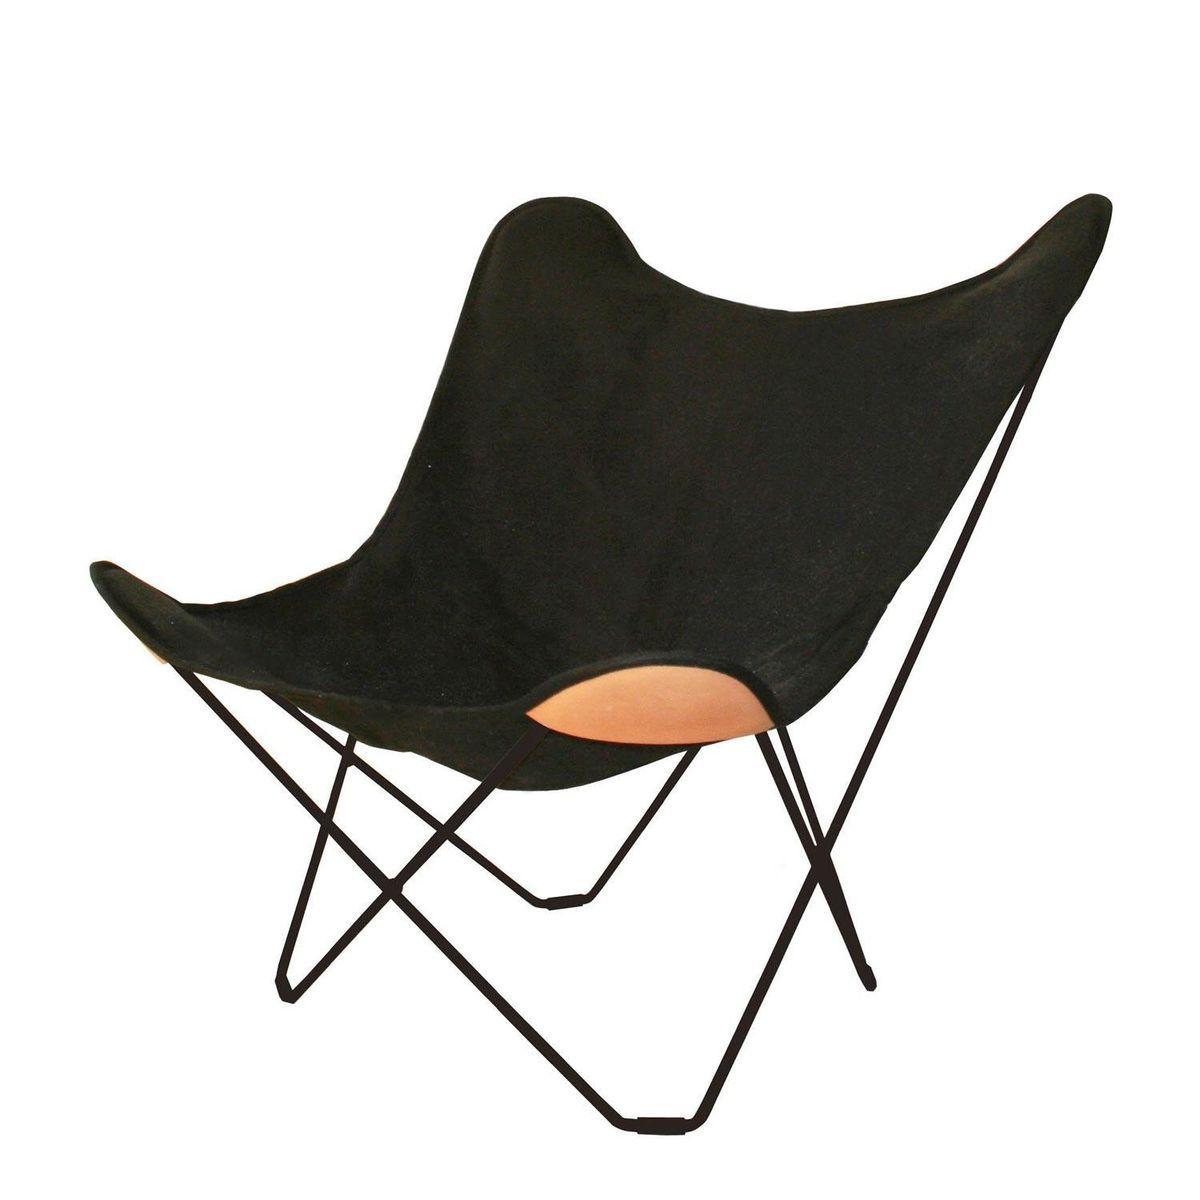 Charming Cuero   Canvas Mariposa Butterfly Chair   Black/frame Black